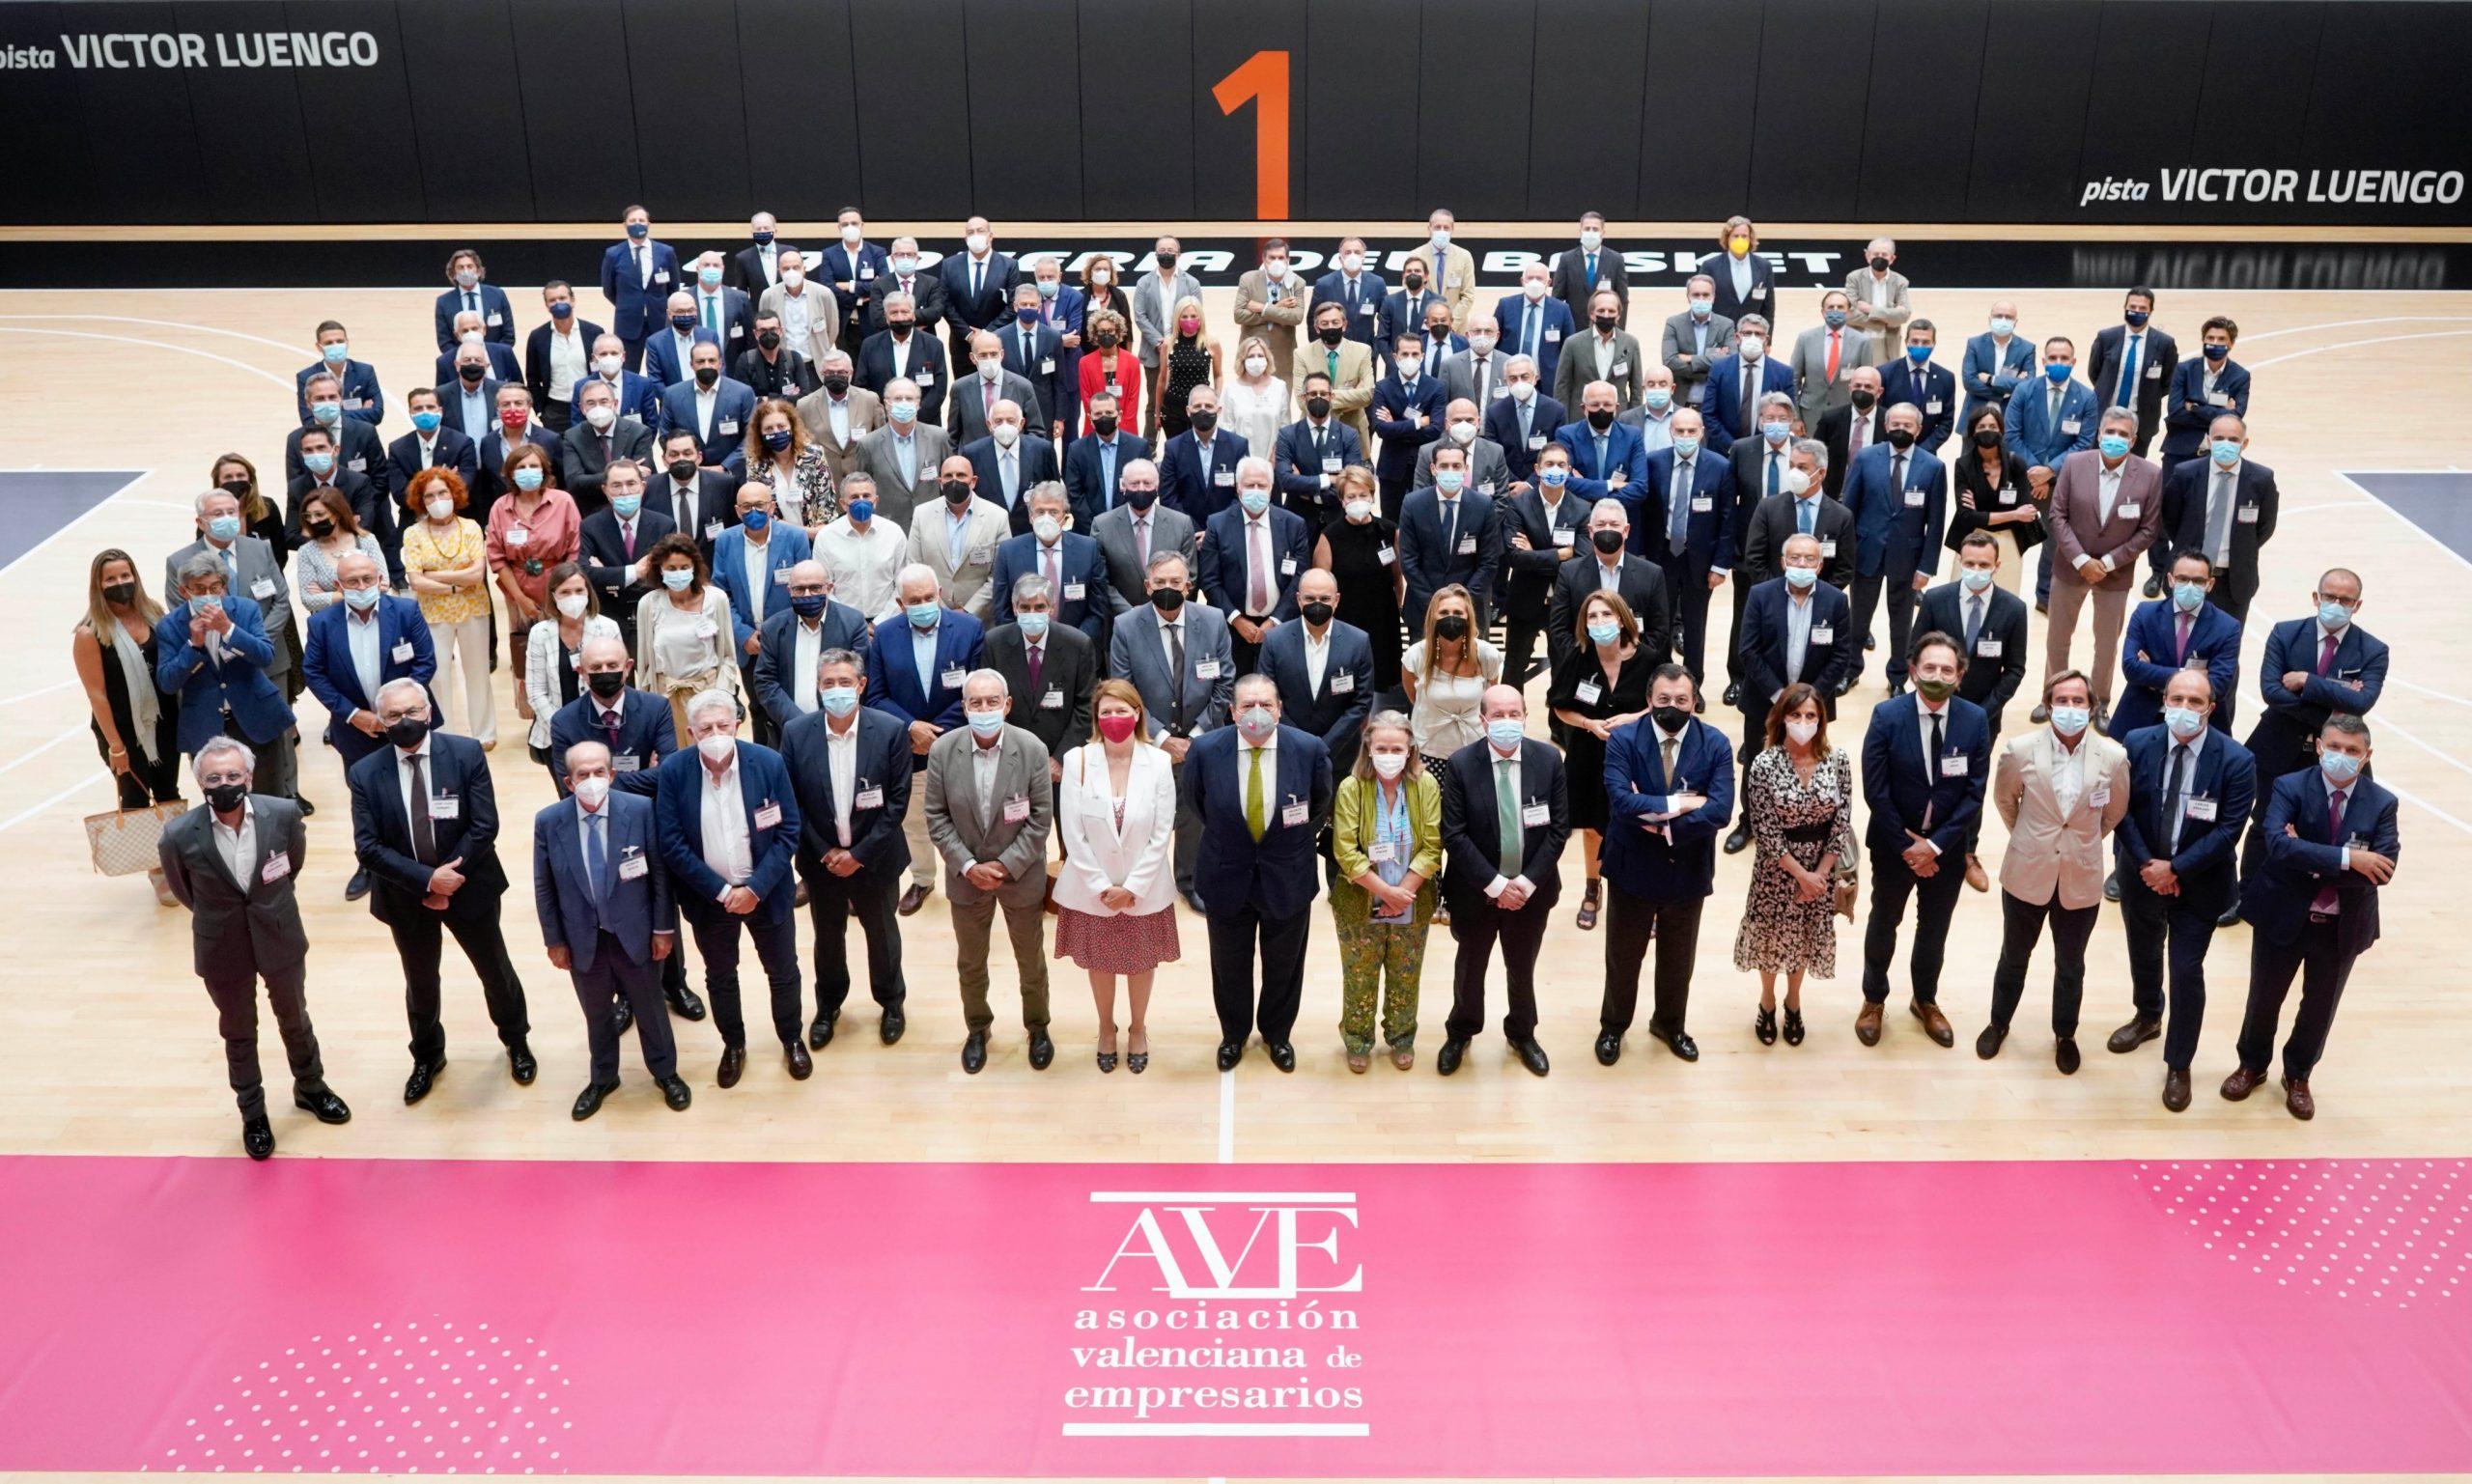 Foto de familia de los asistentes a la asamblea de la AVE